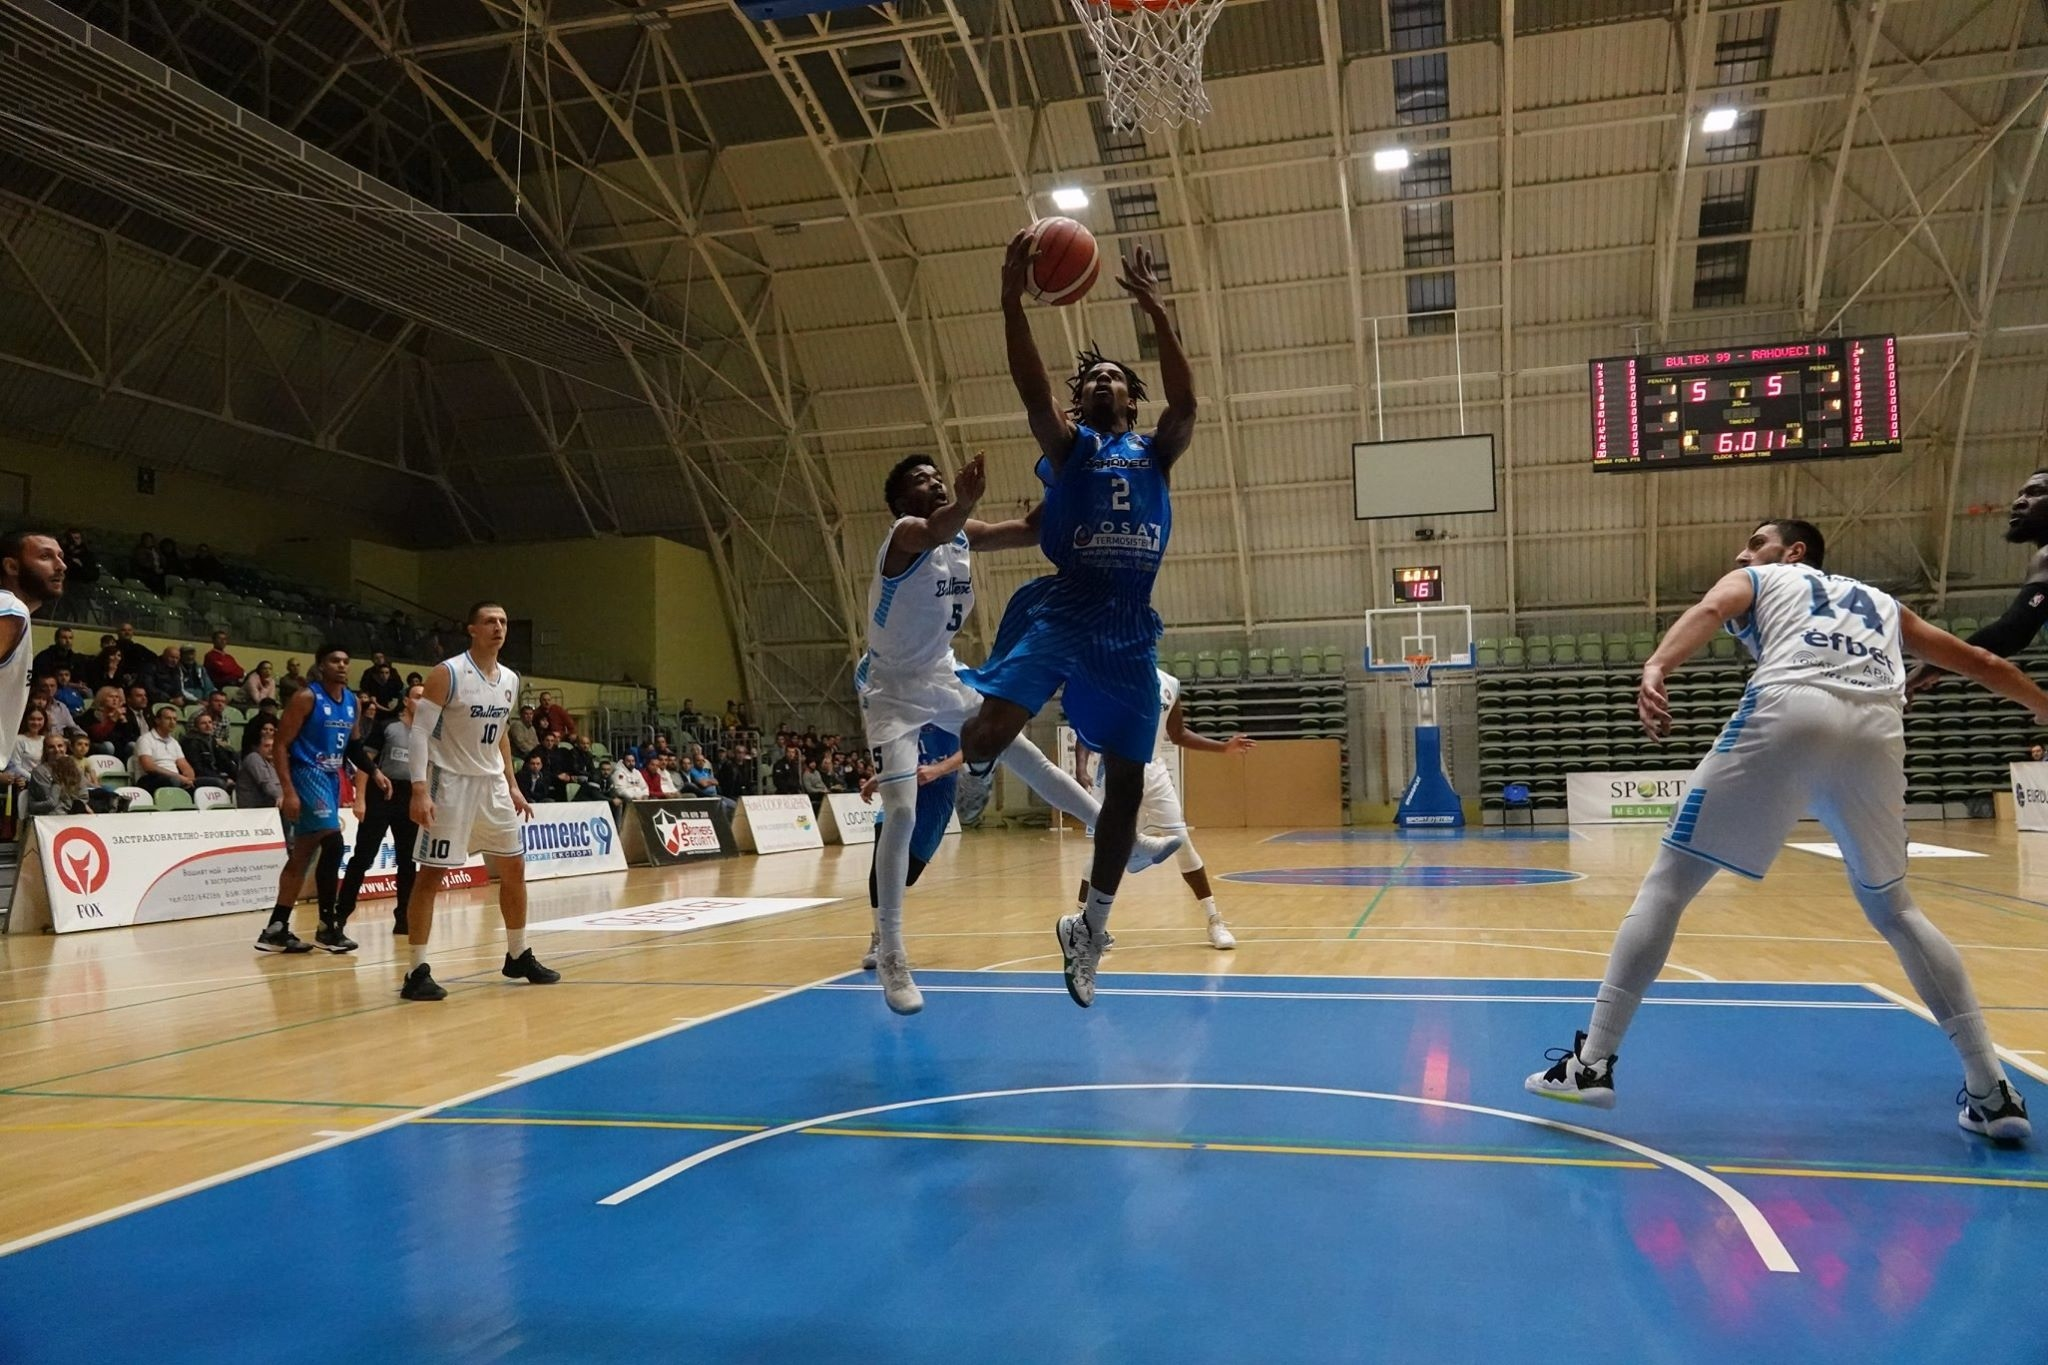 Академик Бултекс 99 започна успешно новия сезон в Балканската баскетболна